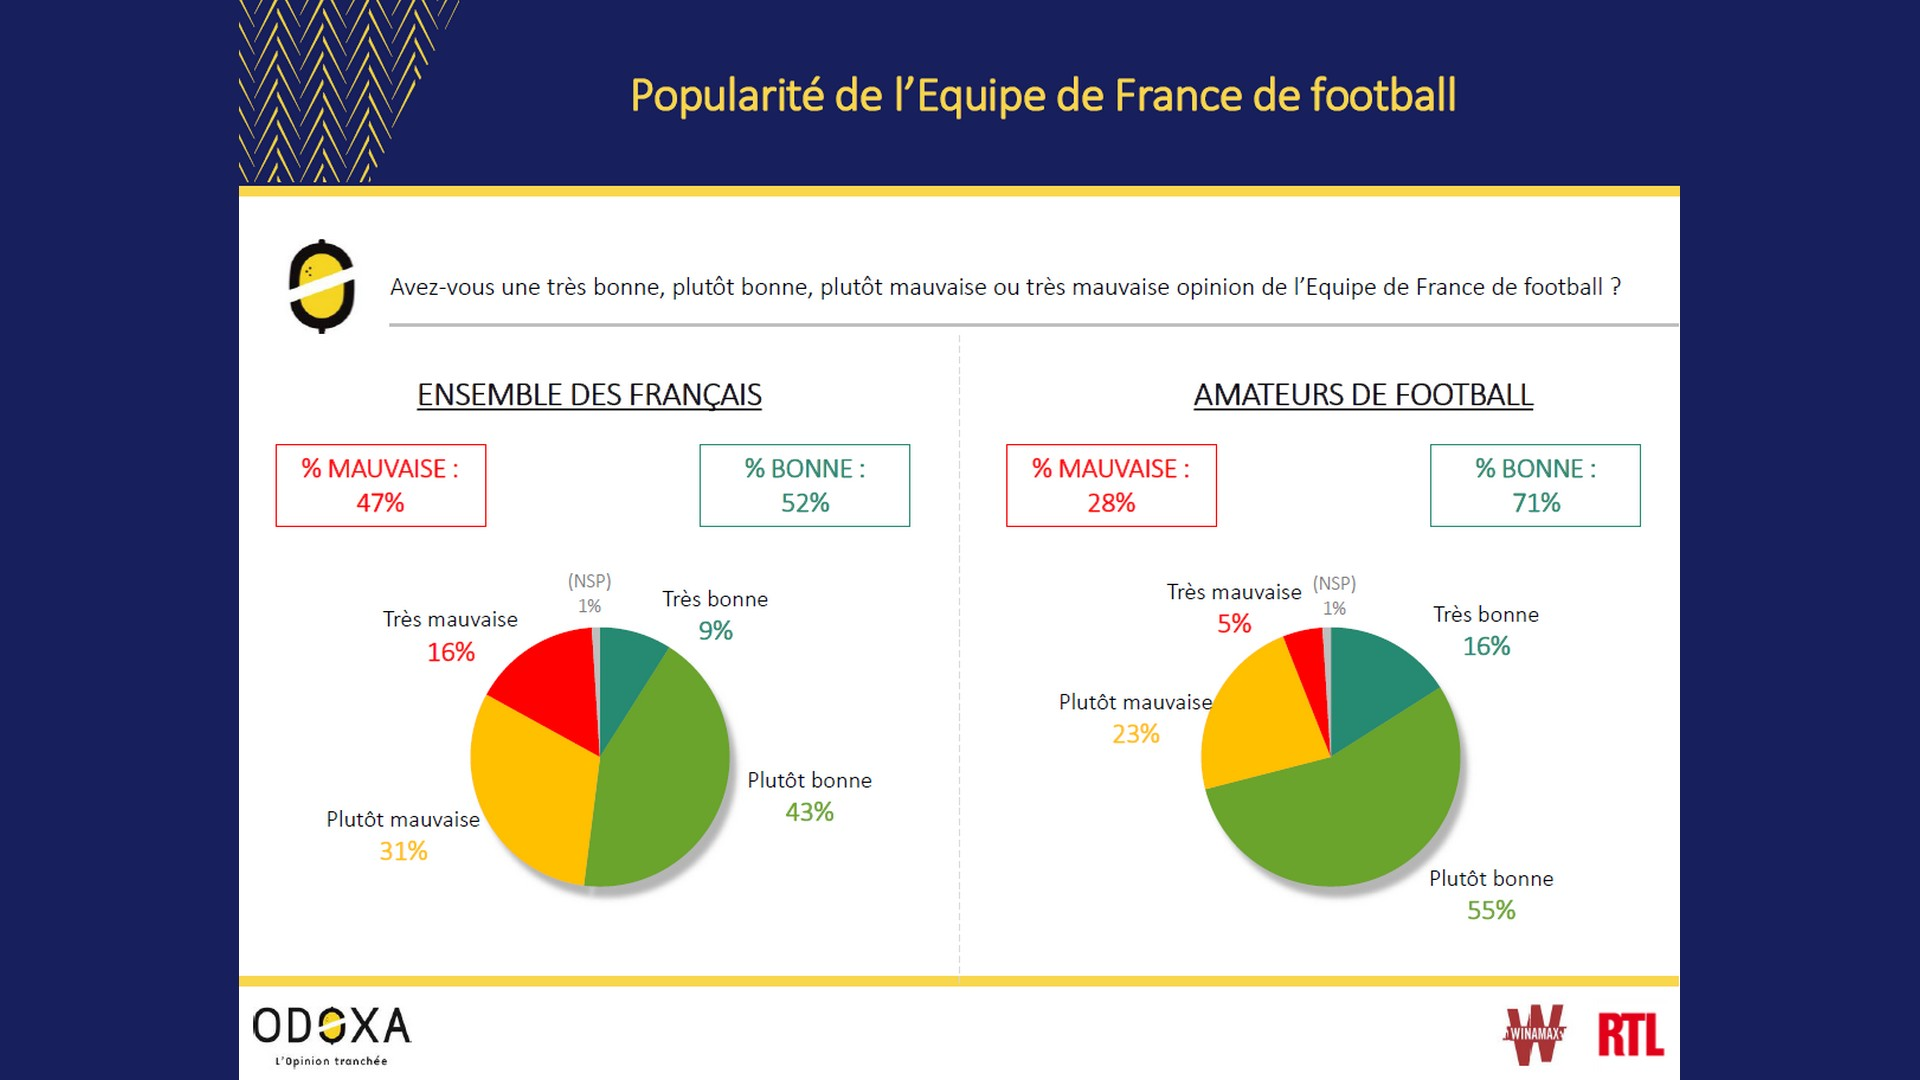 Odoxa Baromètre – Image équipe de France Euro 2020